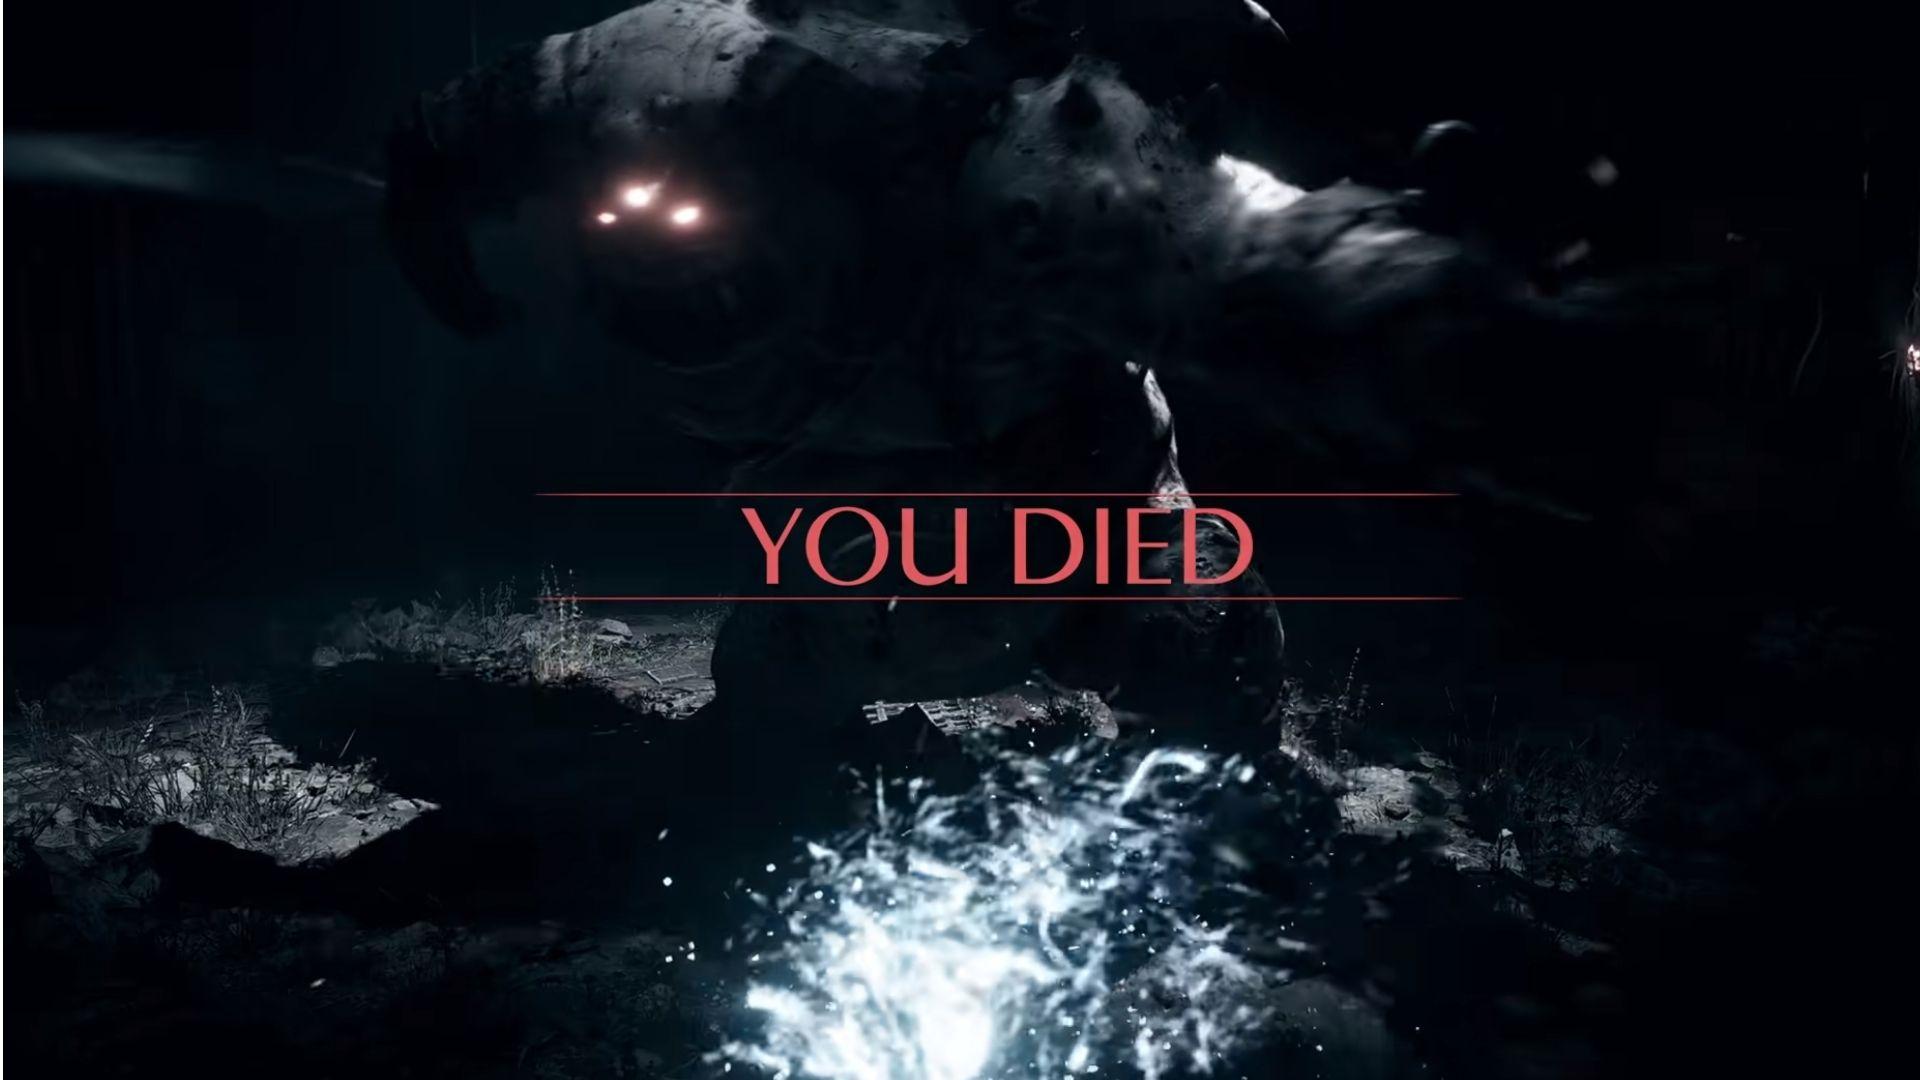 the youd died screen in demon's souls